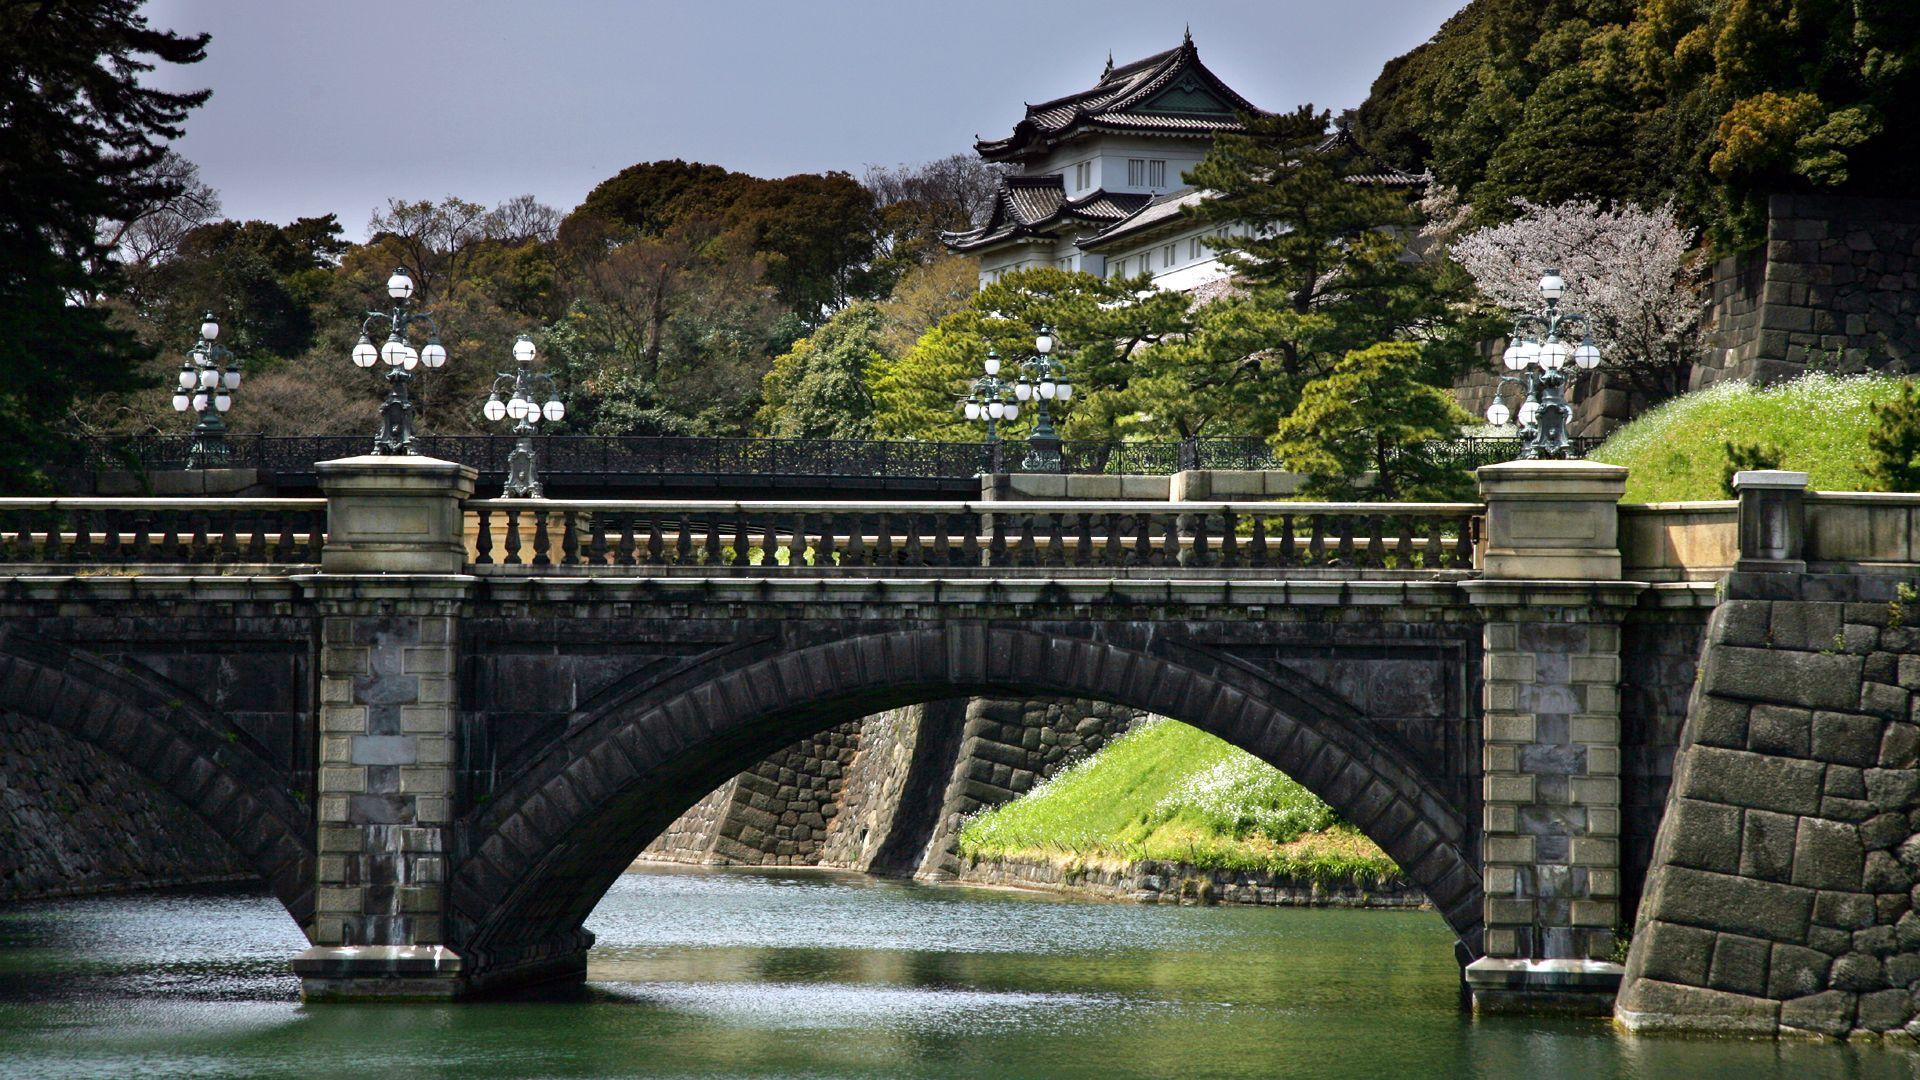 japan architecture wallpaper - photo #11